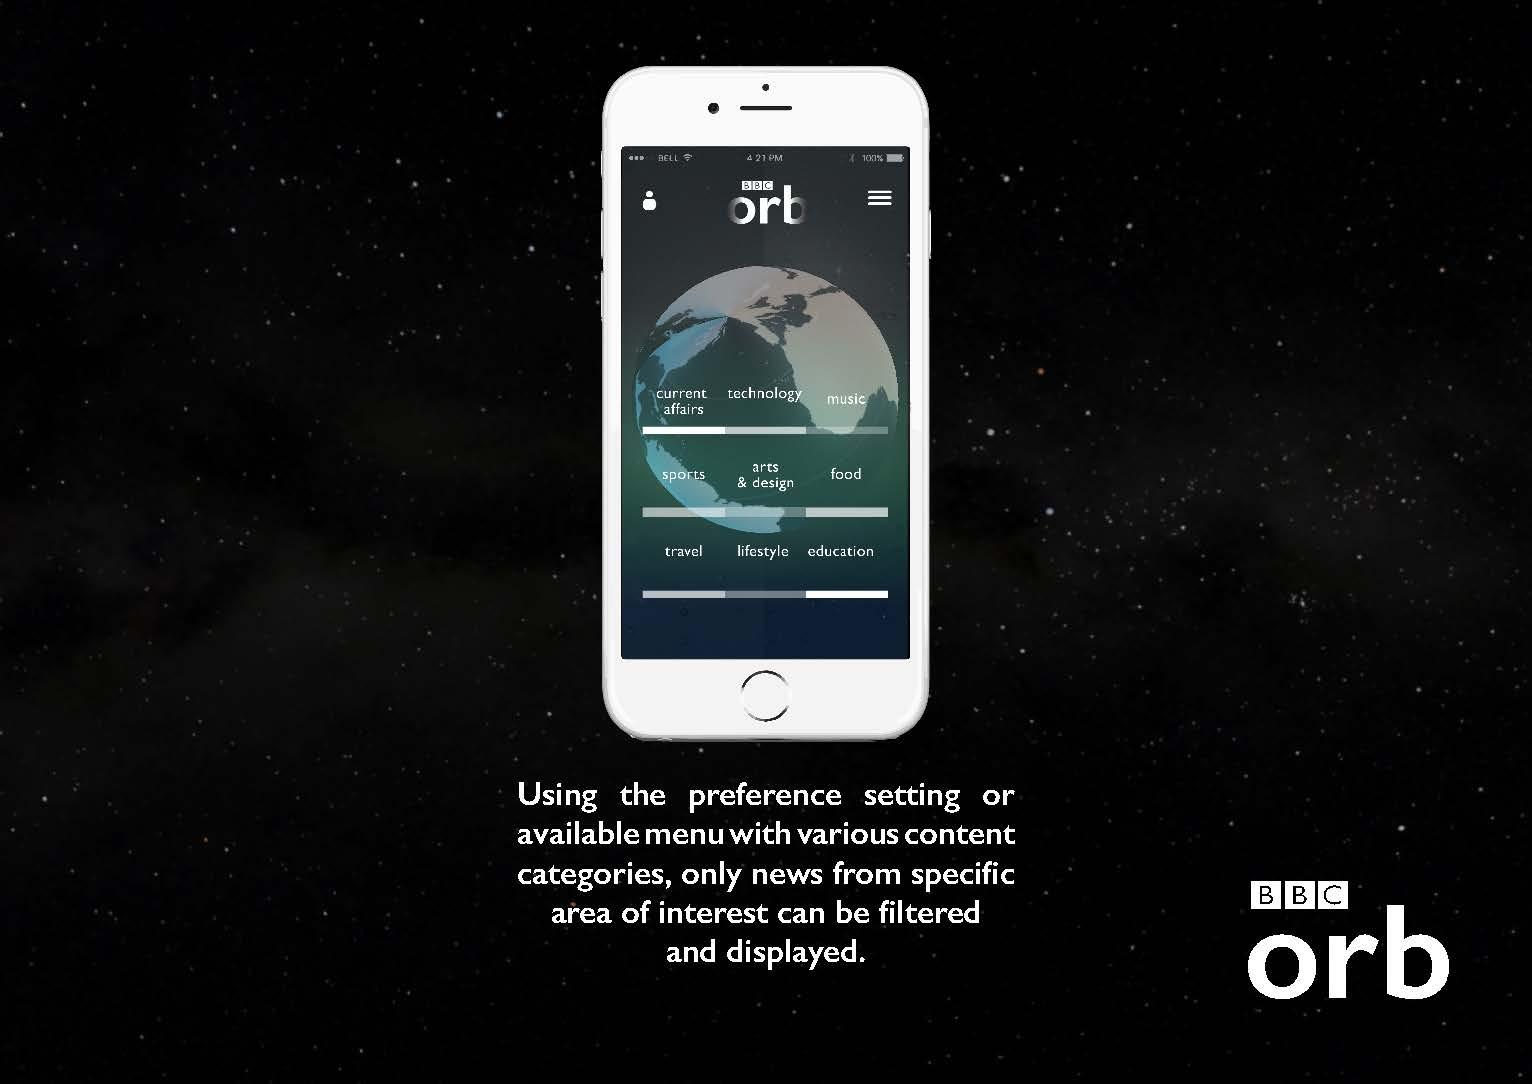 BBC Orb presentation_Page_3.jpg